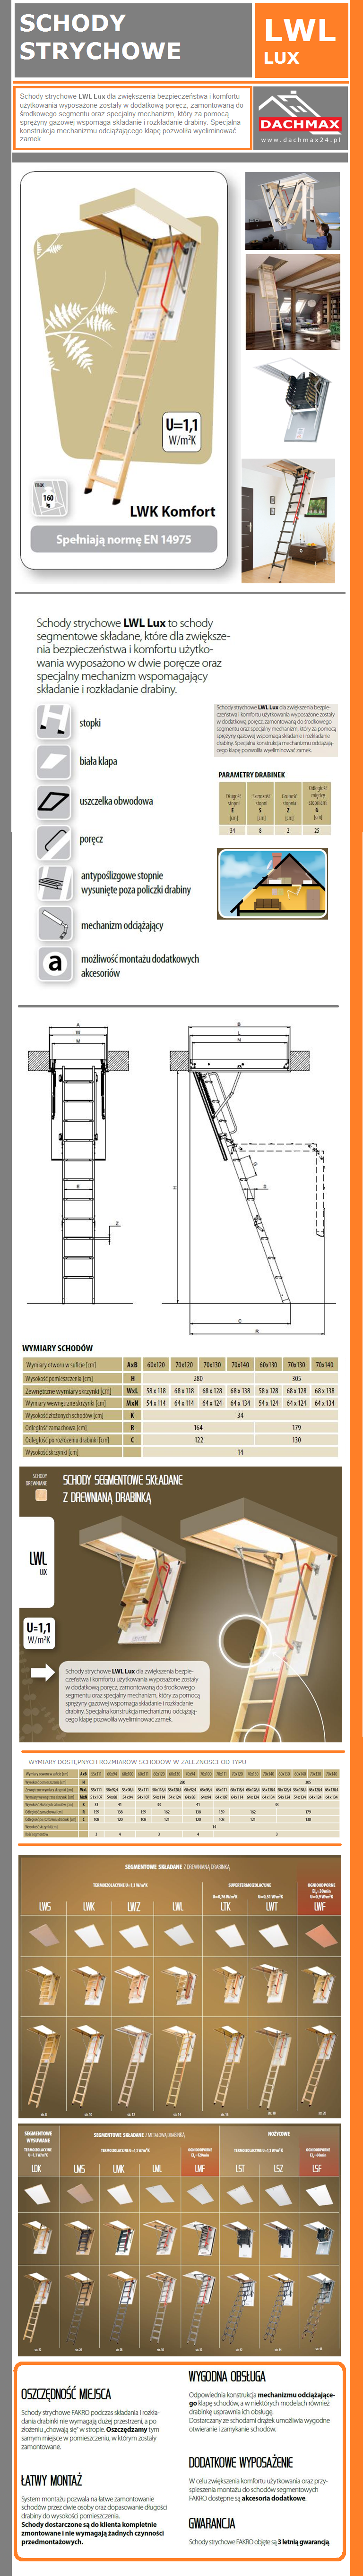 lwl lux schody strychowe fakro segmentowe sk adane z drewnian drabink dwie por cze. Black Bedroom Furniture Sets. Home Design Ideas